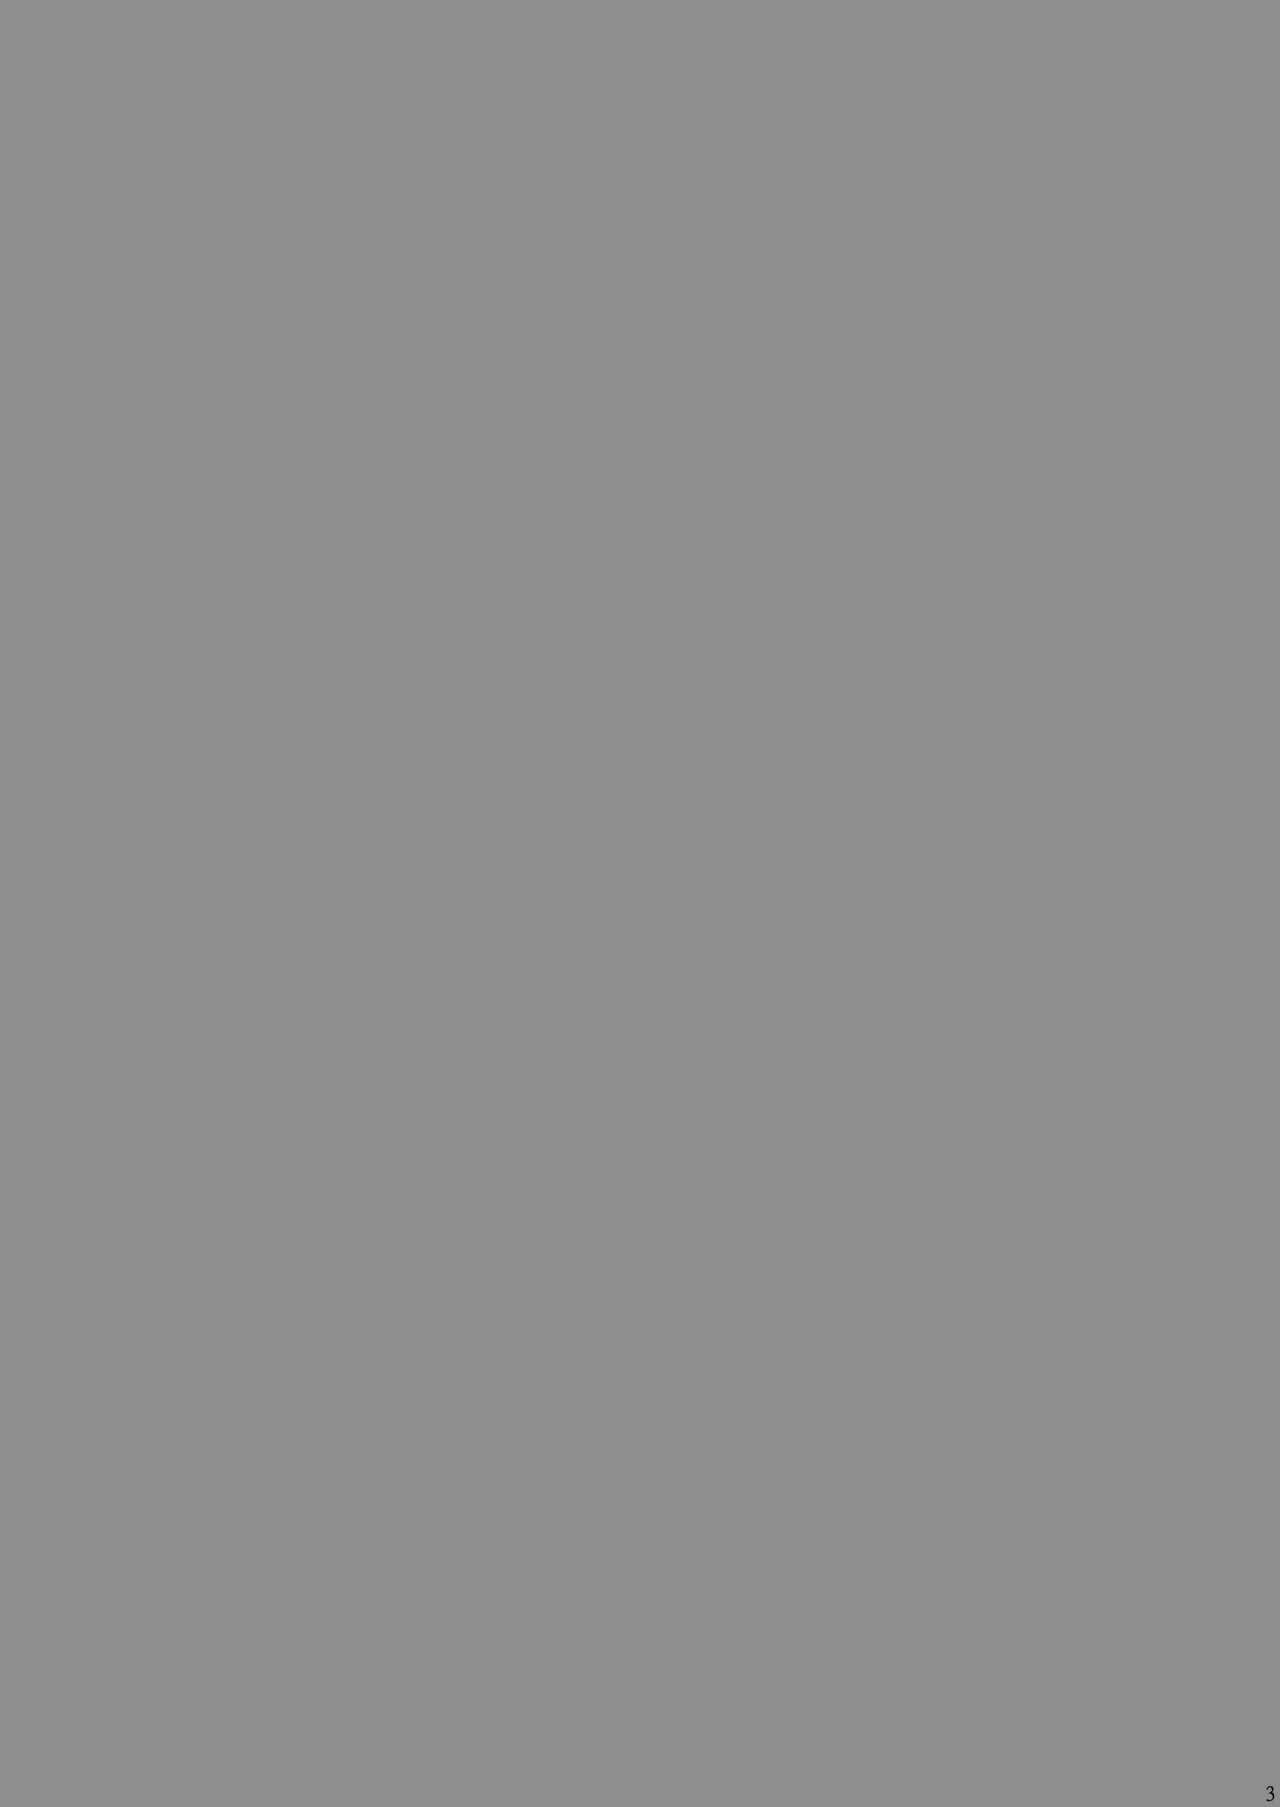 [Asanoya (Kittsu)] Toraware Hime III - Asuna Nakadashi 100-nin Dekiru ka na   Hostage Princess III (Sword Art Online) [English] [HypnoMangaEditor] [Digital] 1